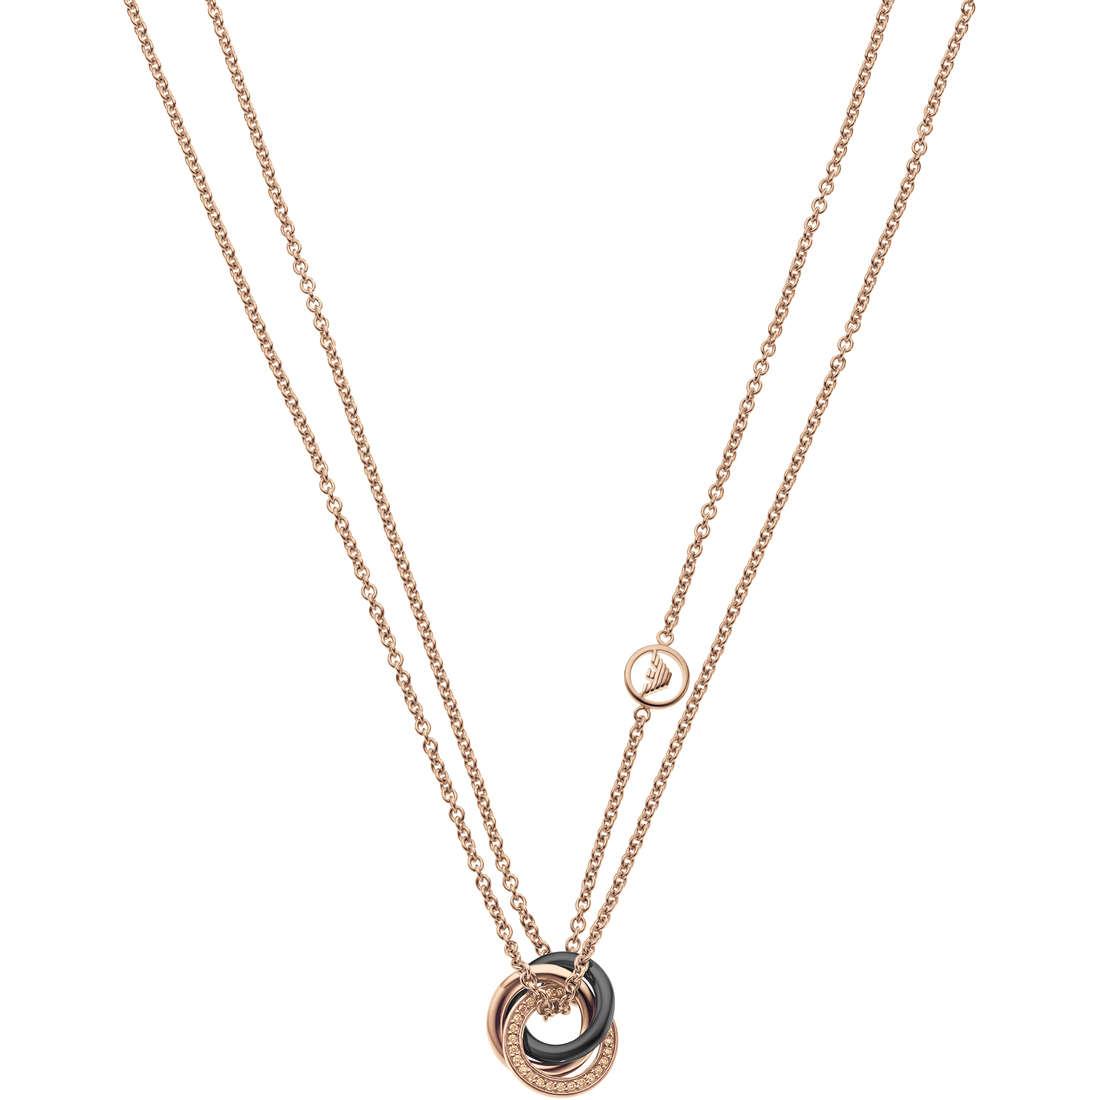 necklace woman jewellery Emporio Armani Fall 2013 EG3084221